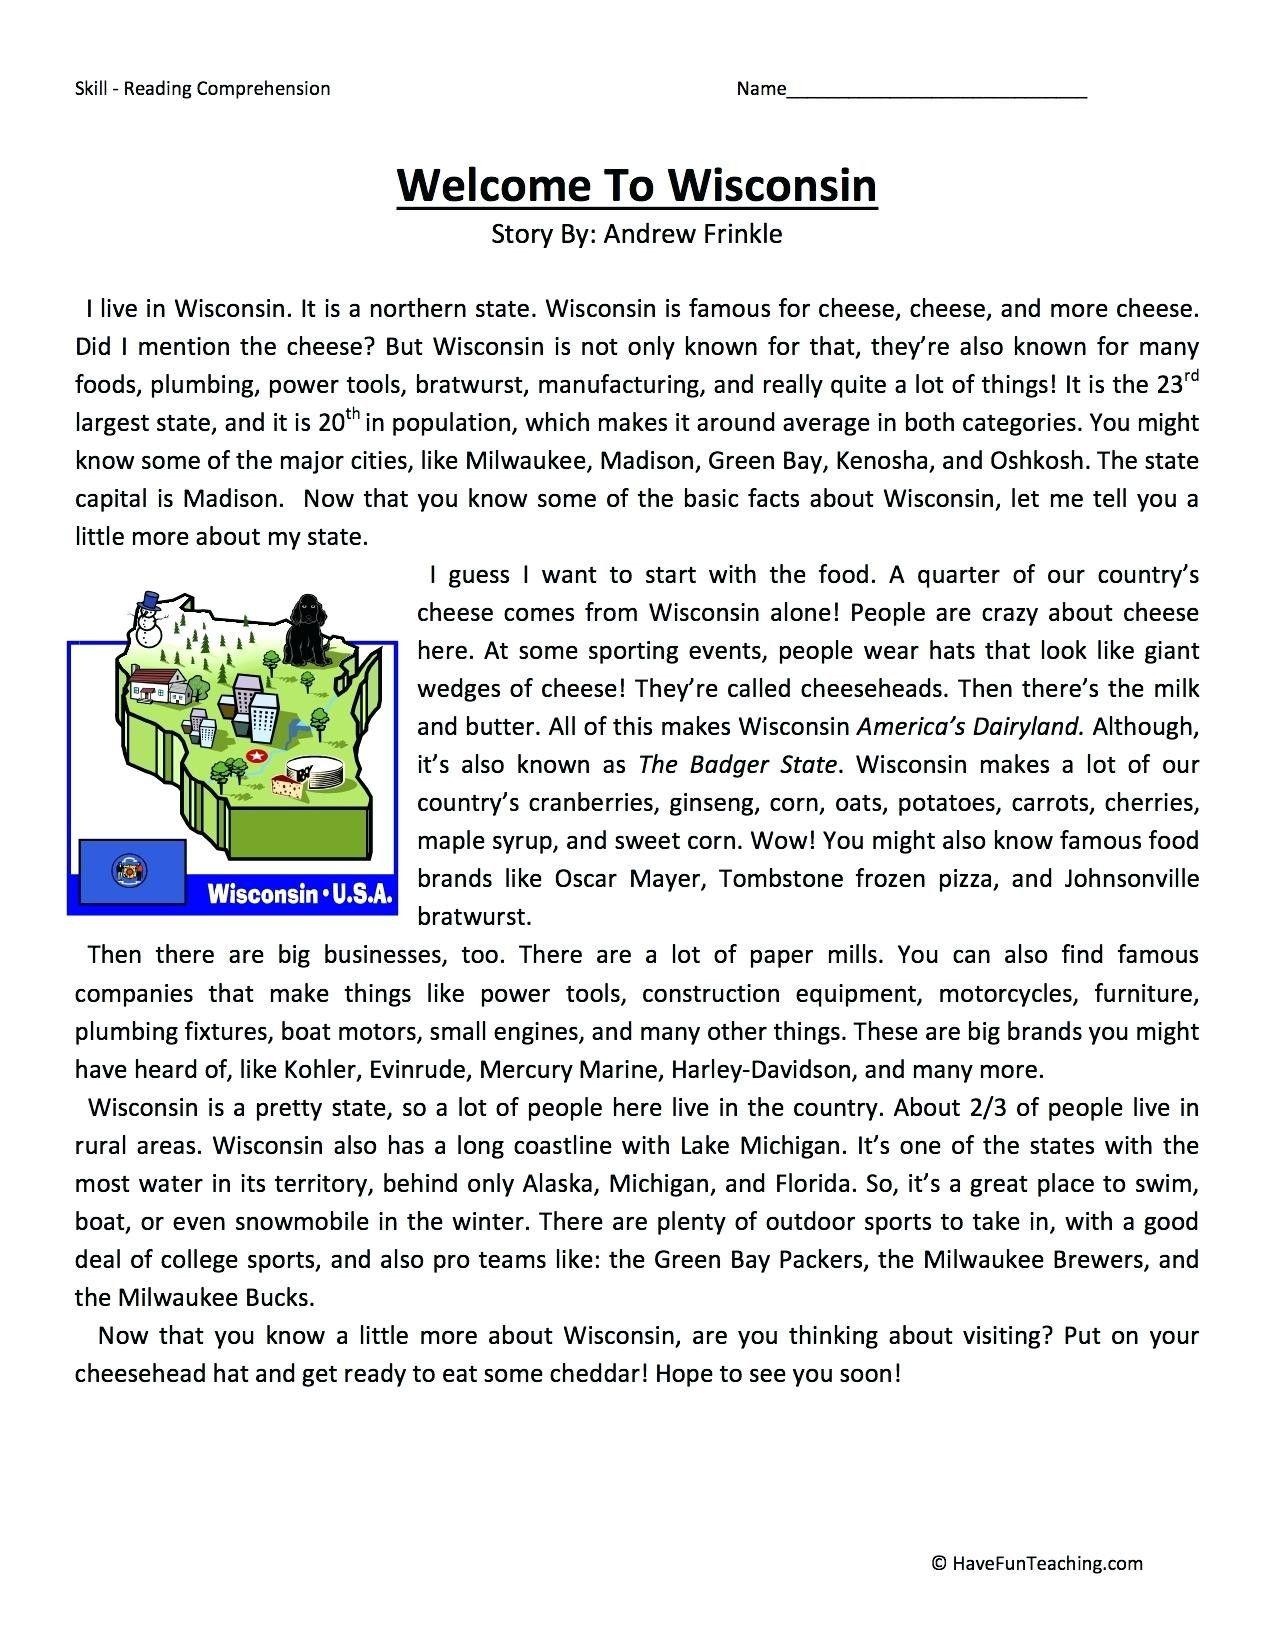 5 Reading Comprehension Worksheets 4th Grade Reading